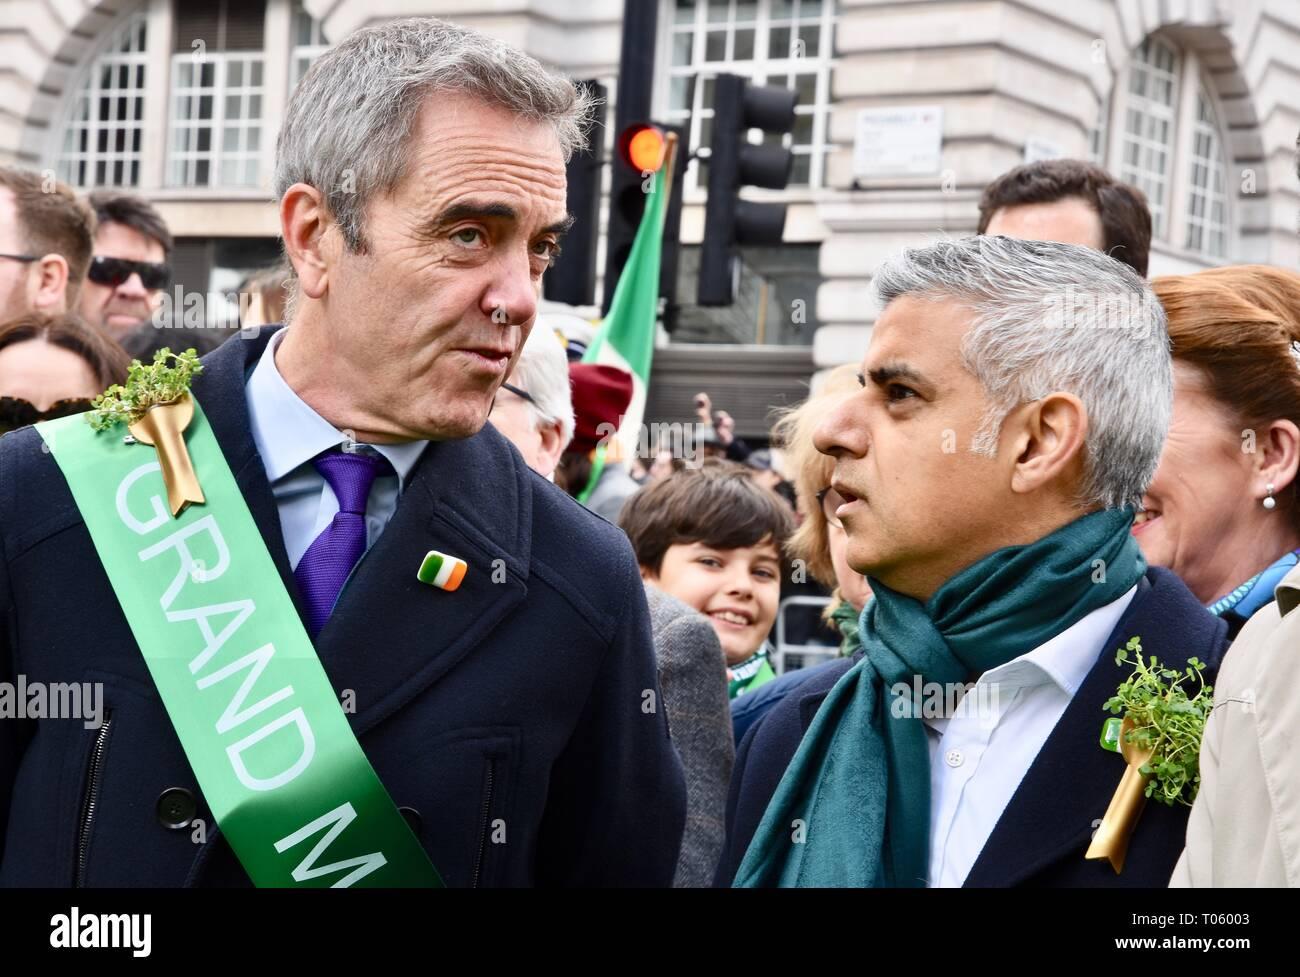 London, UK. 17th Mar, 2019. James Nesbitt,Sadiq Khan.St Patrick's Day Parade,Piccadilly,London.UK Credit: michael melia/Alamy Live News - Stock Image